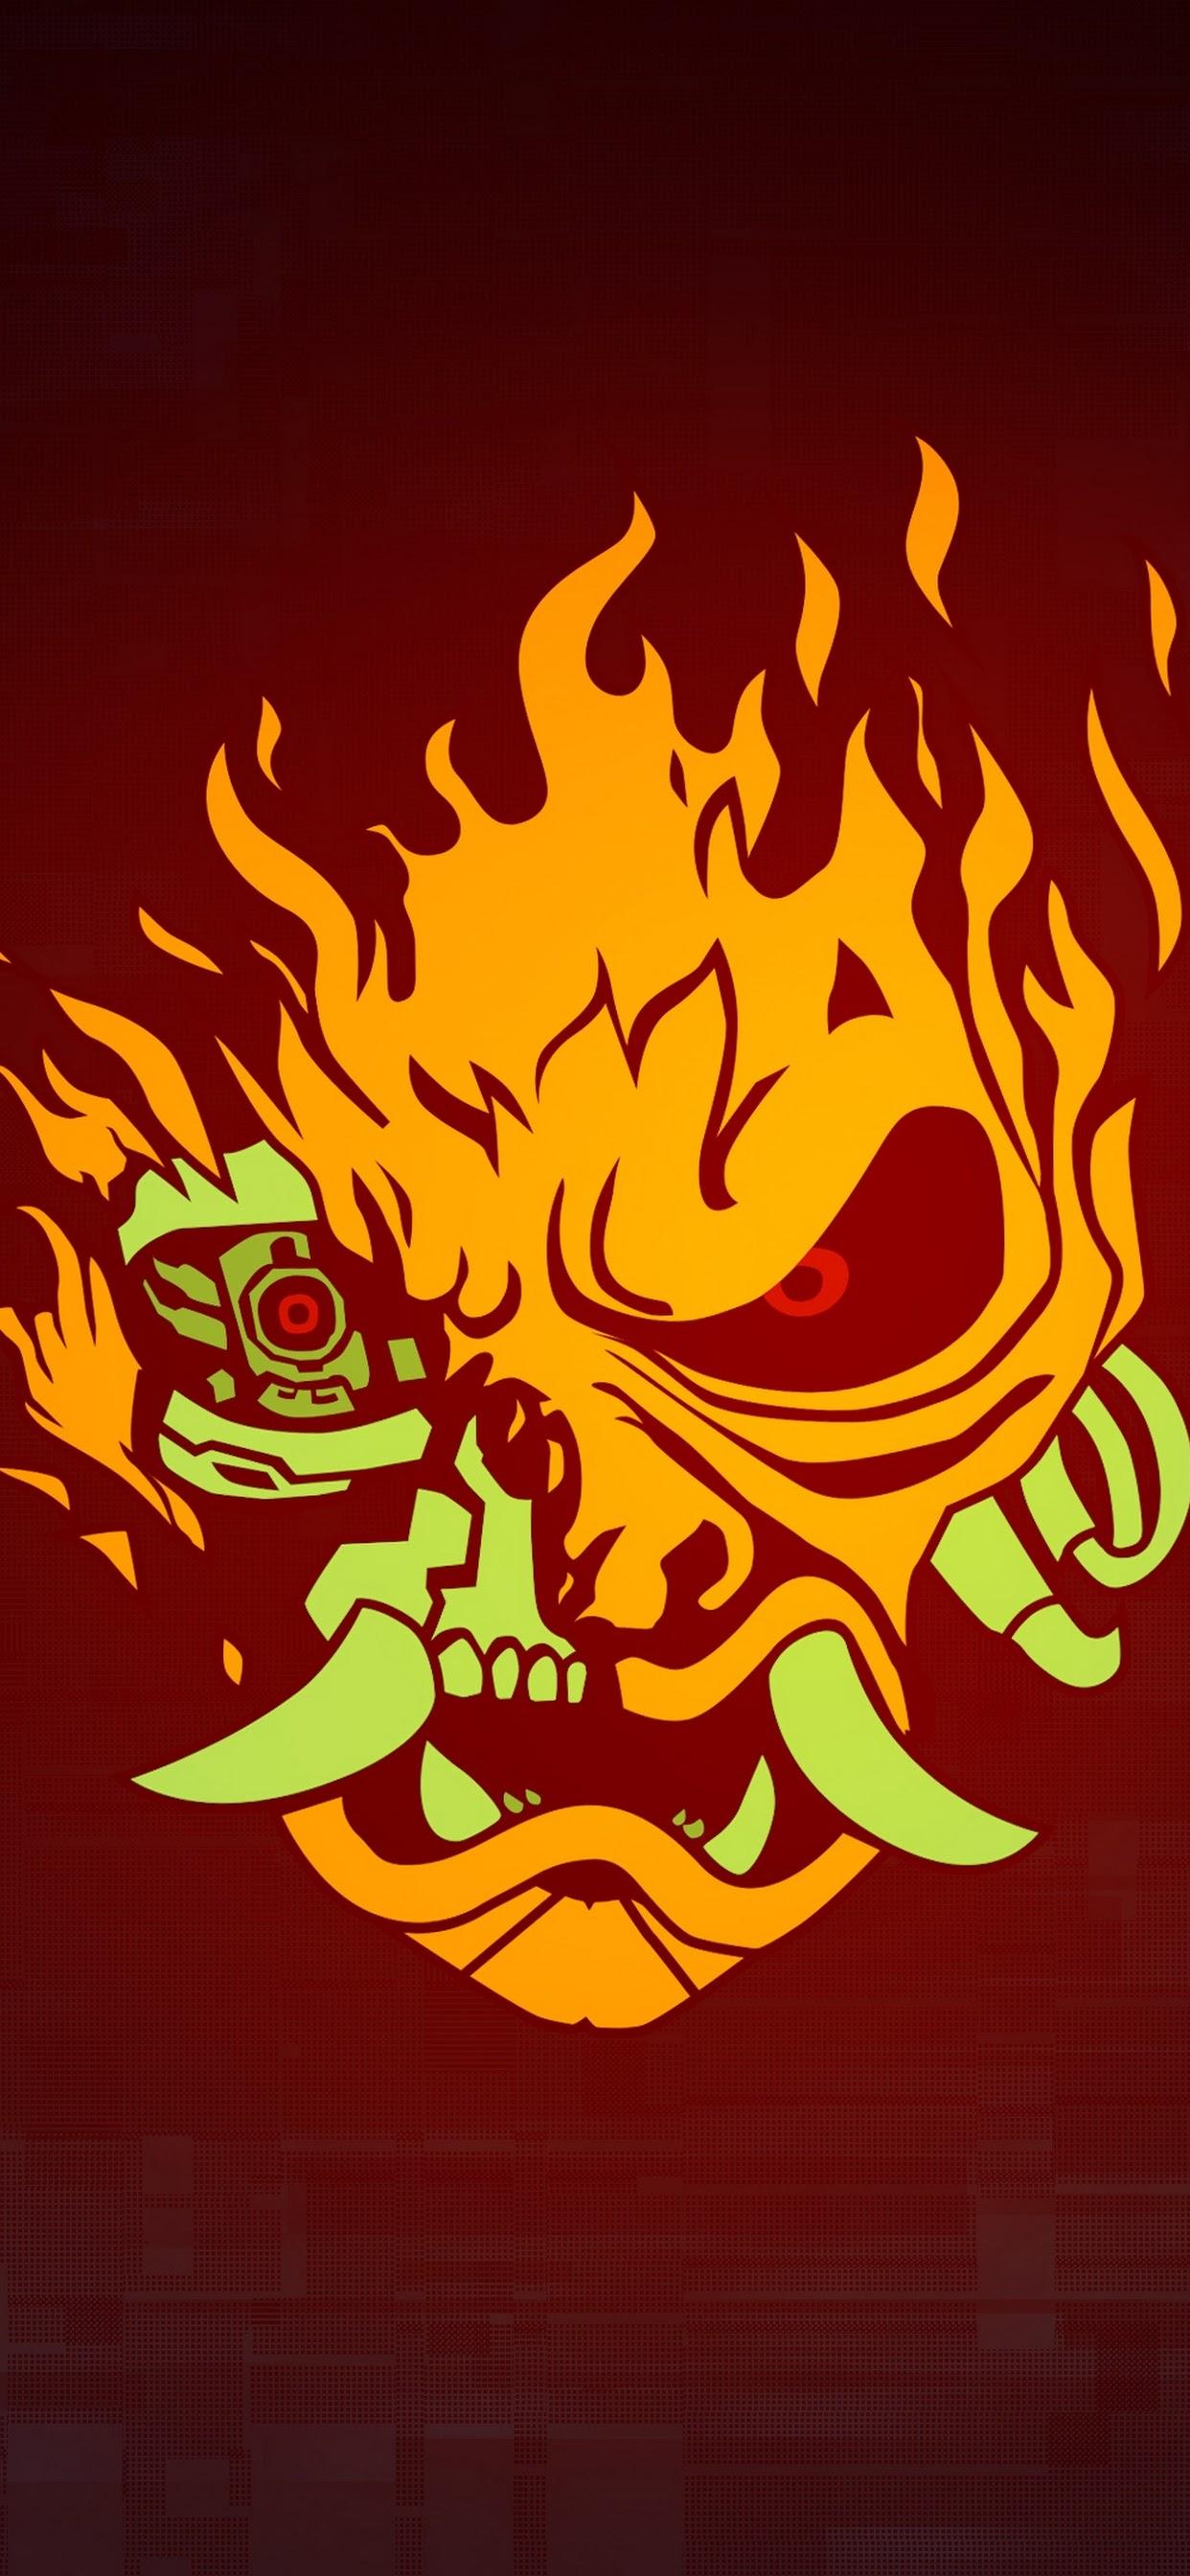 Cyberpunk 2077 Samurai Logo 4k Wallpaper 11